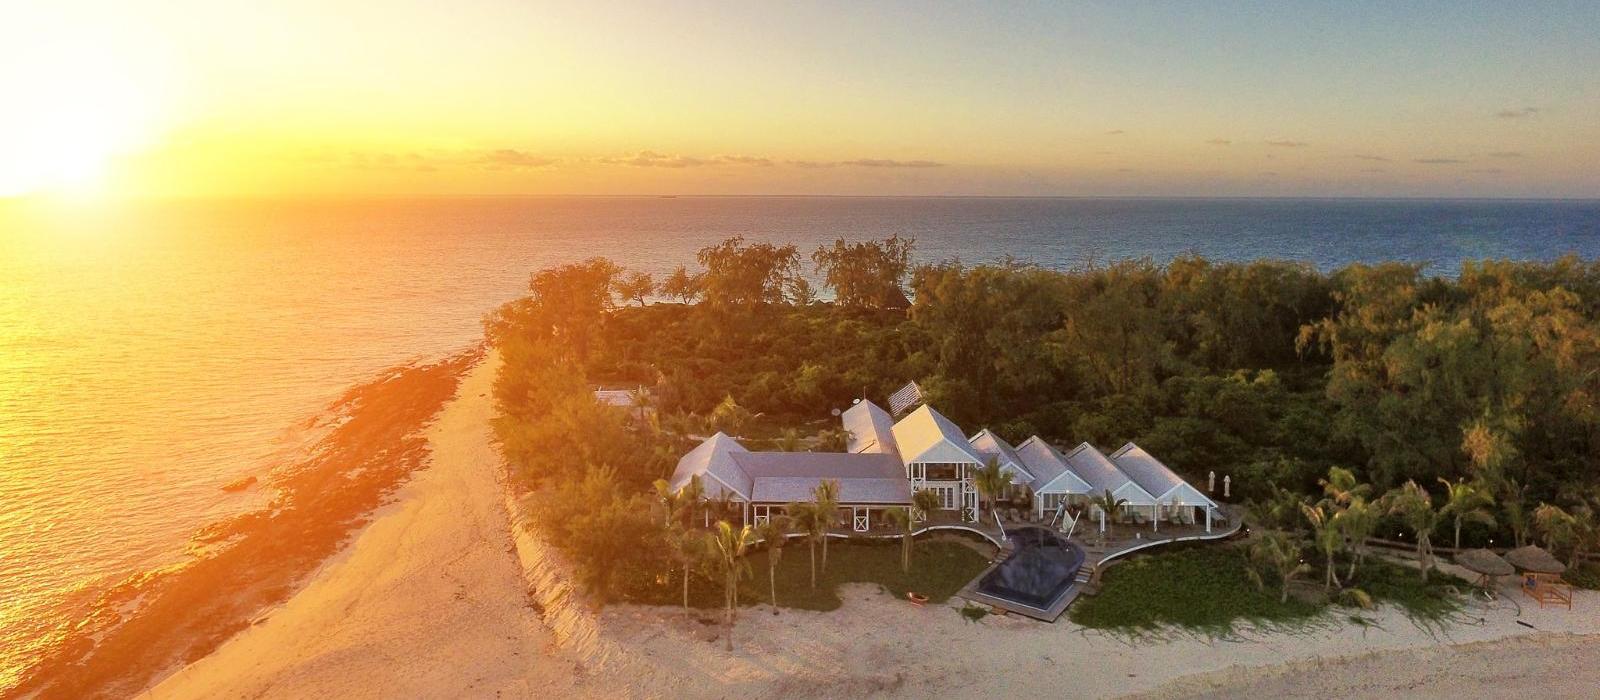 泰达岛酒店(Thanda Island) 图片  www.lhw.cn